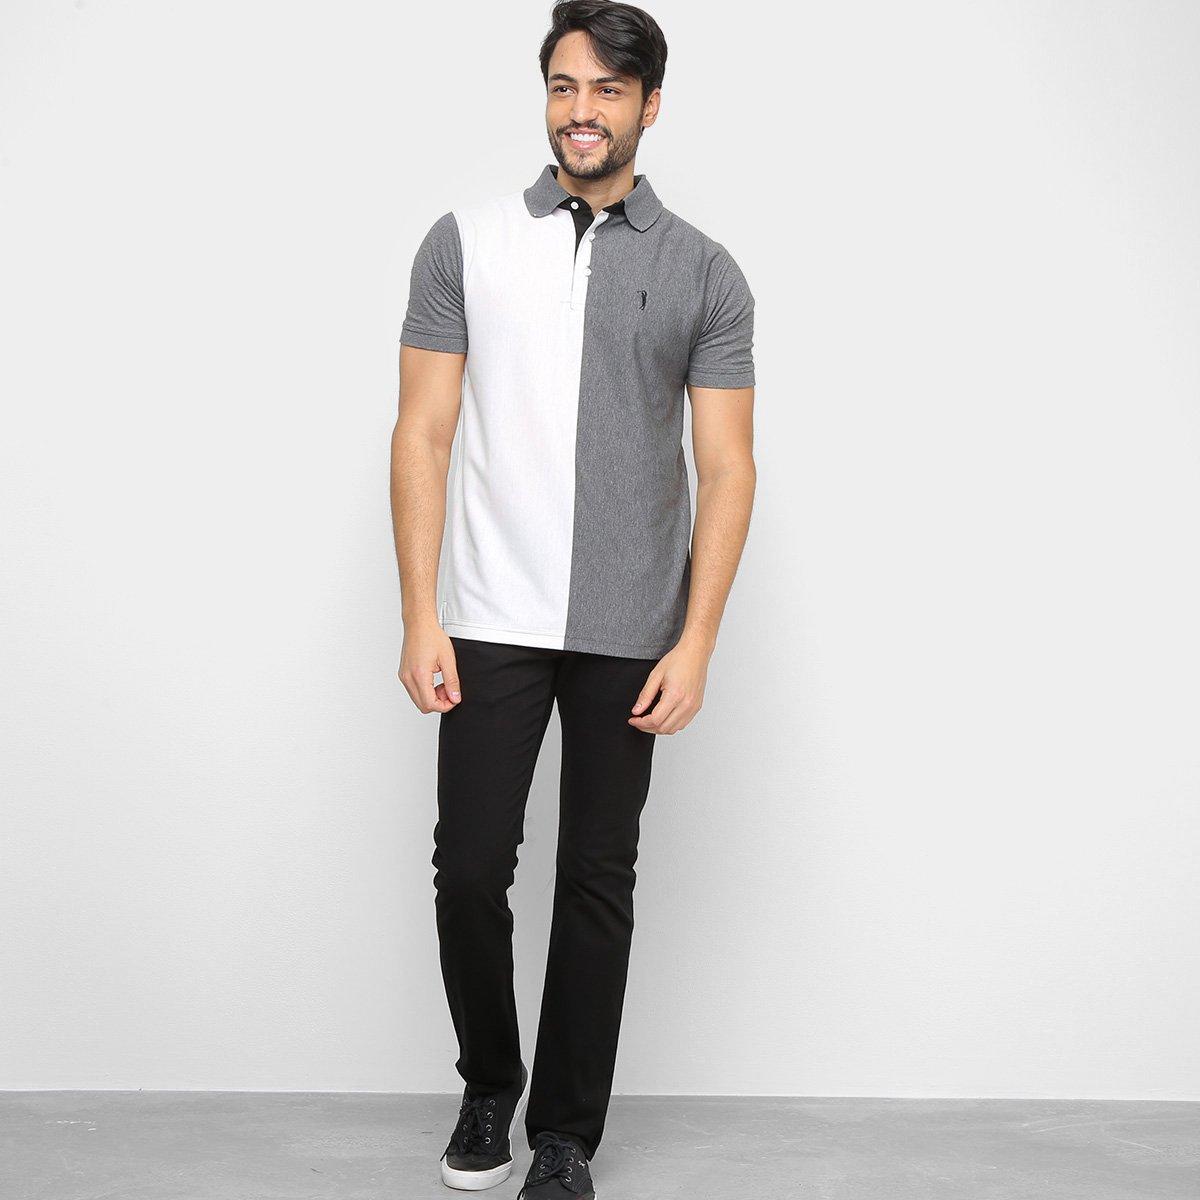 Camisa Polo Aleatory Bicolor Fio Tinto Masculina - Branco e Cinza